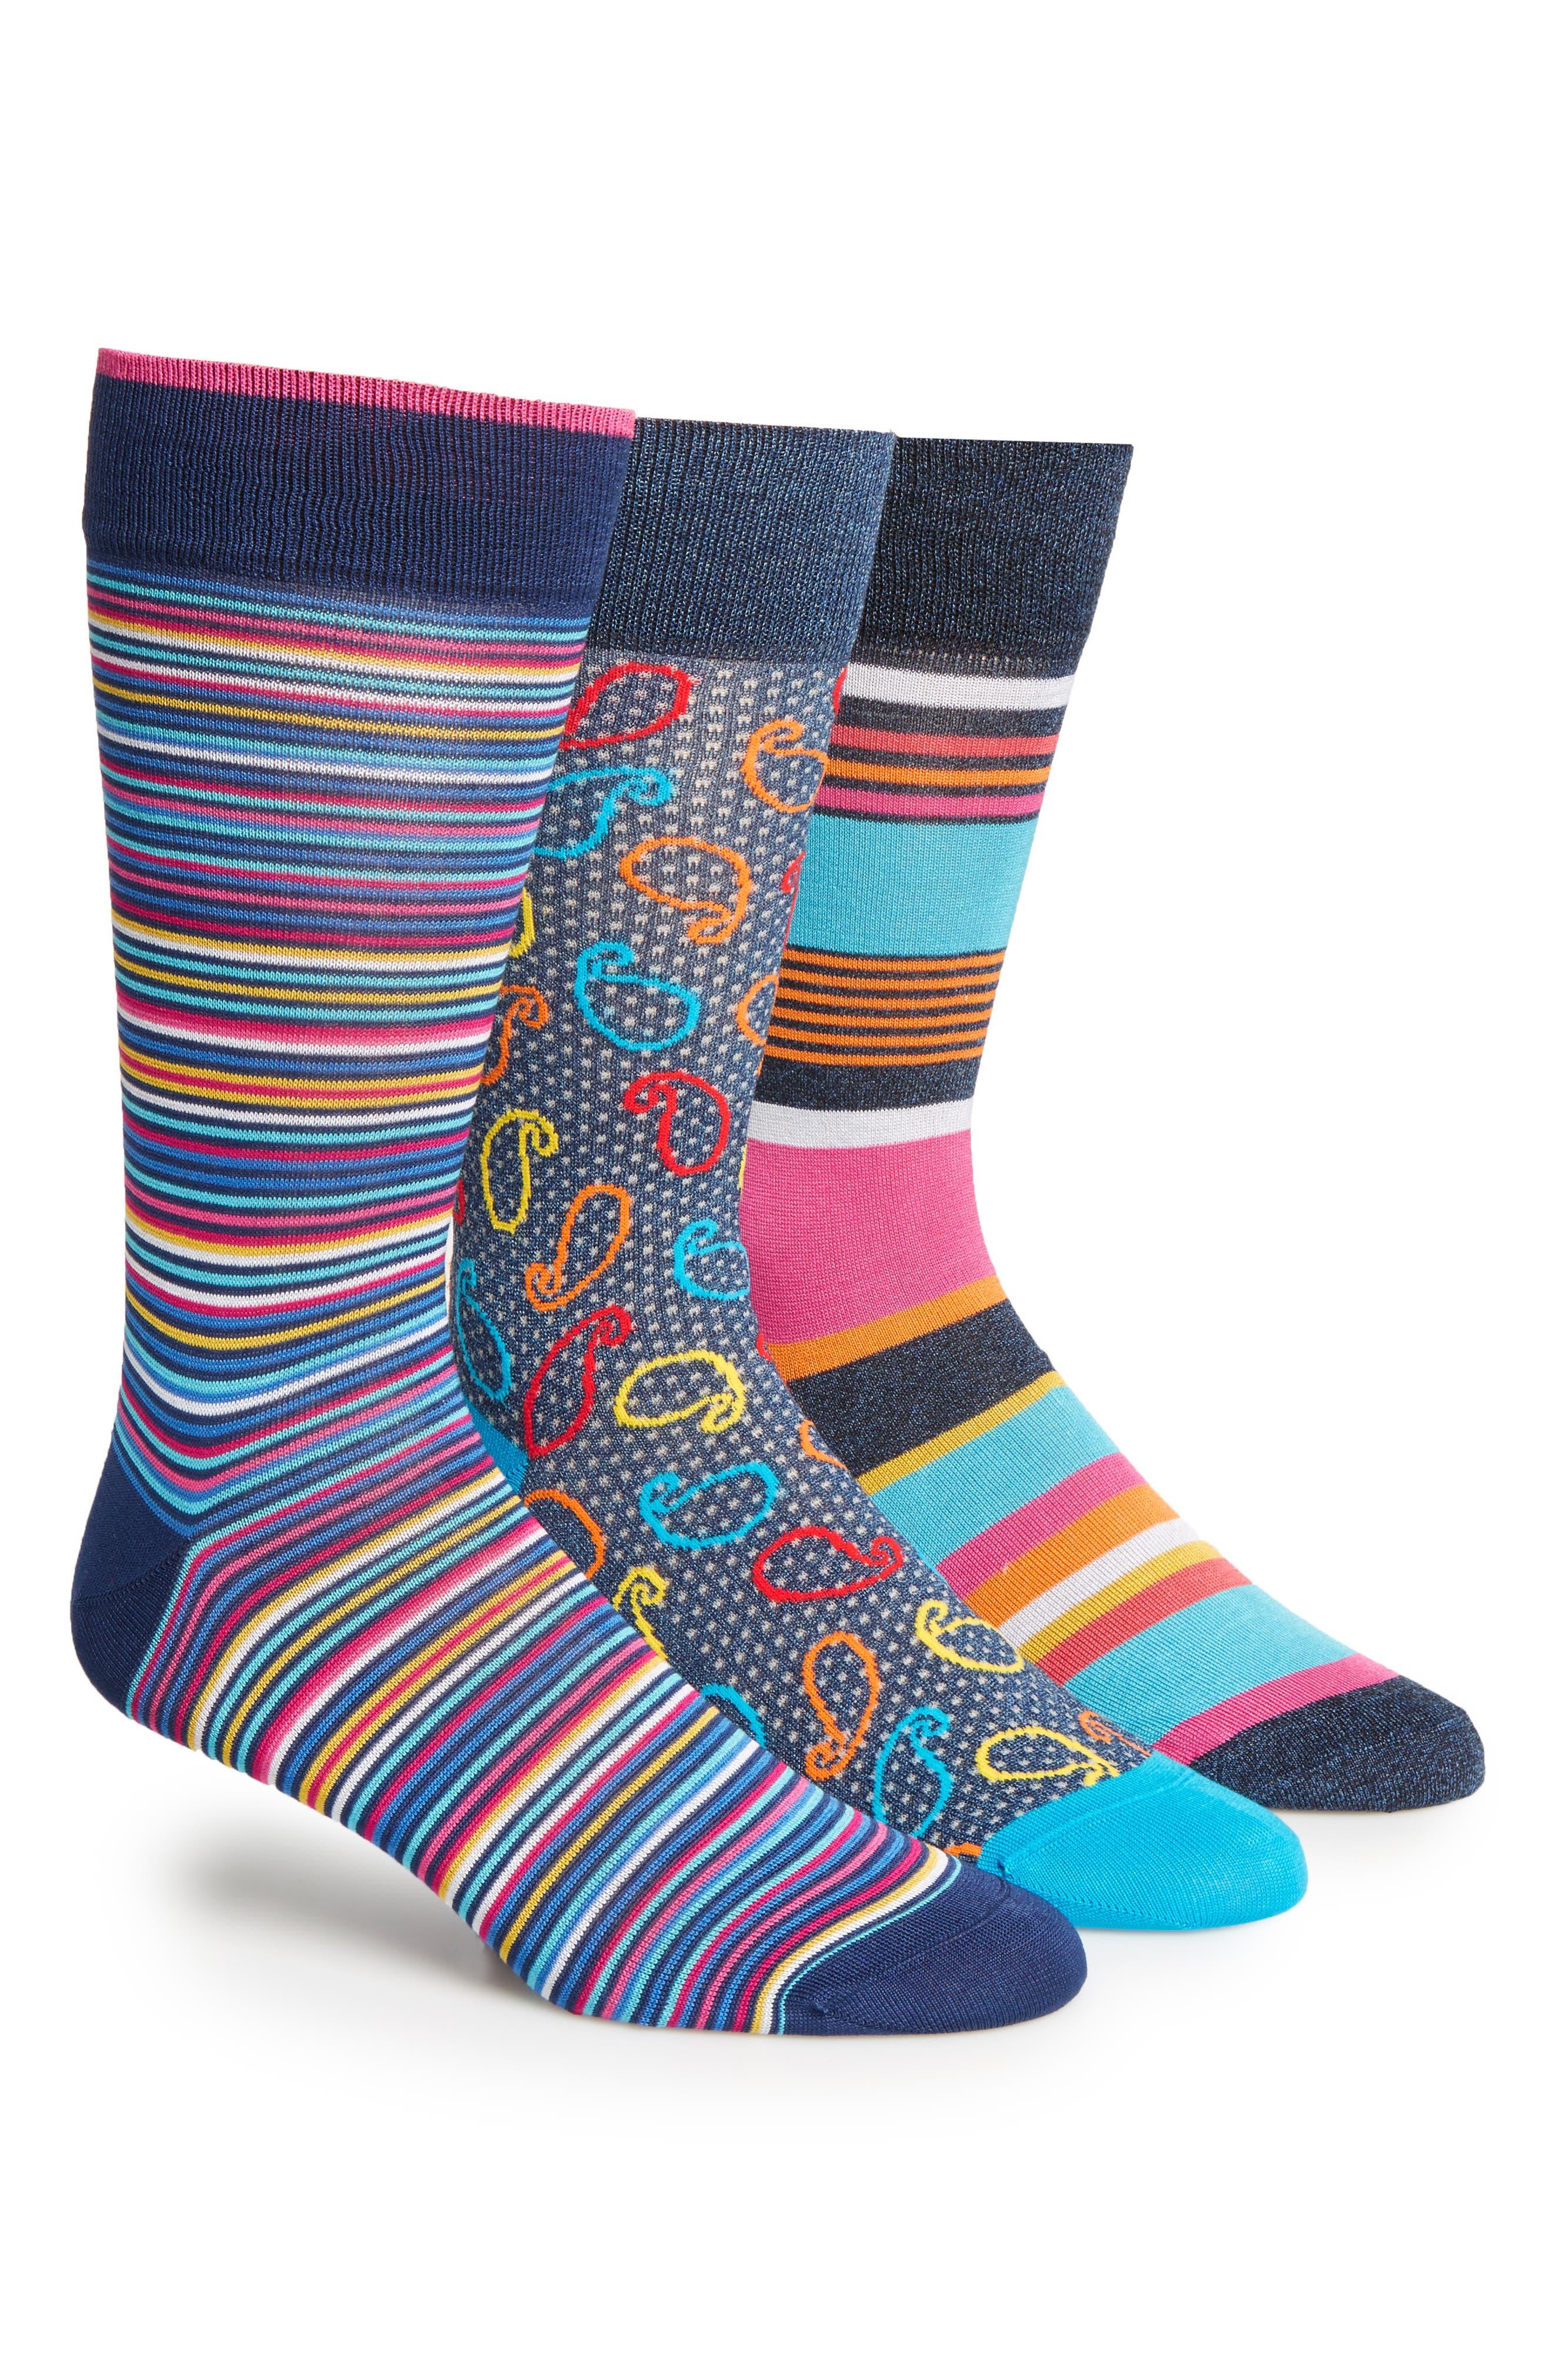 3-Pack Cotton Blend Socks,                         Main,                         color, Navy Glasses/ Blue Stripe